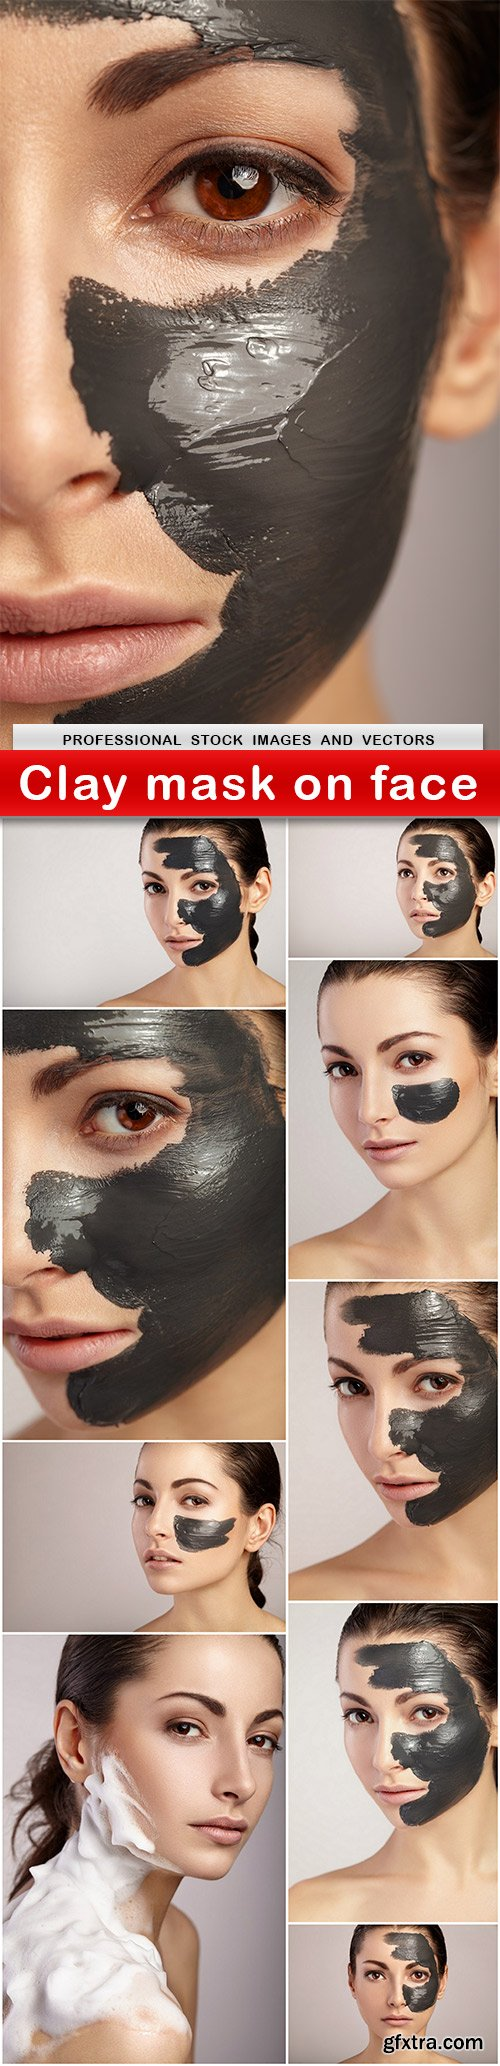 Clay mask on face - 10 UHQ JPEG